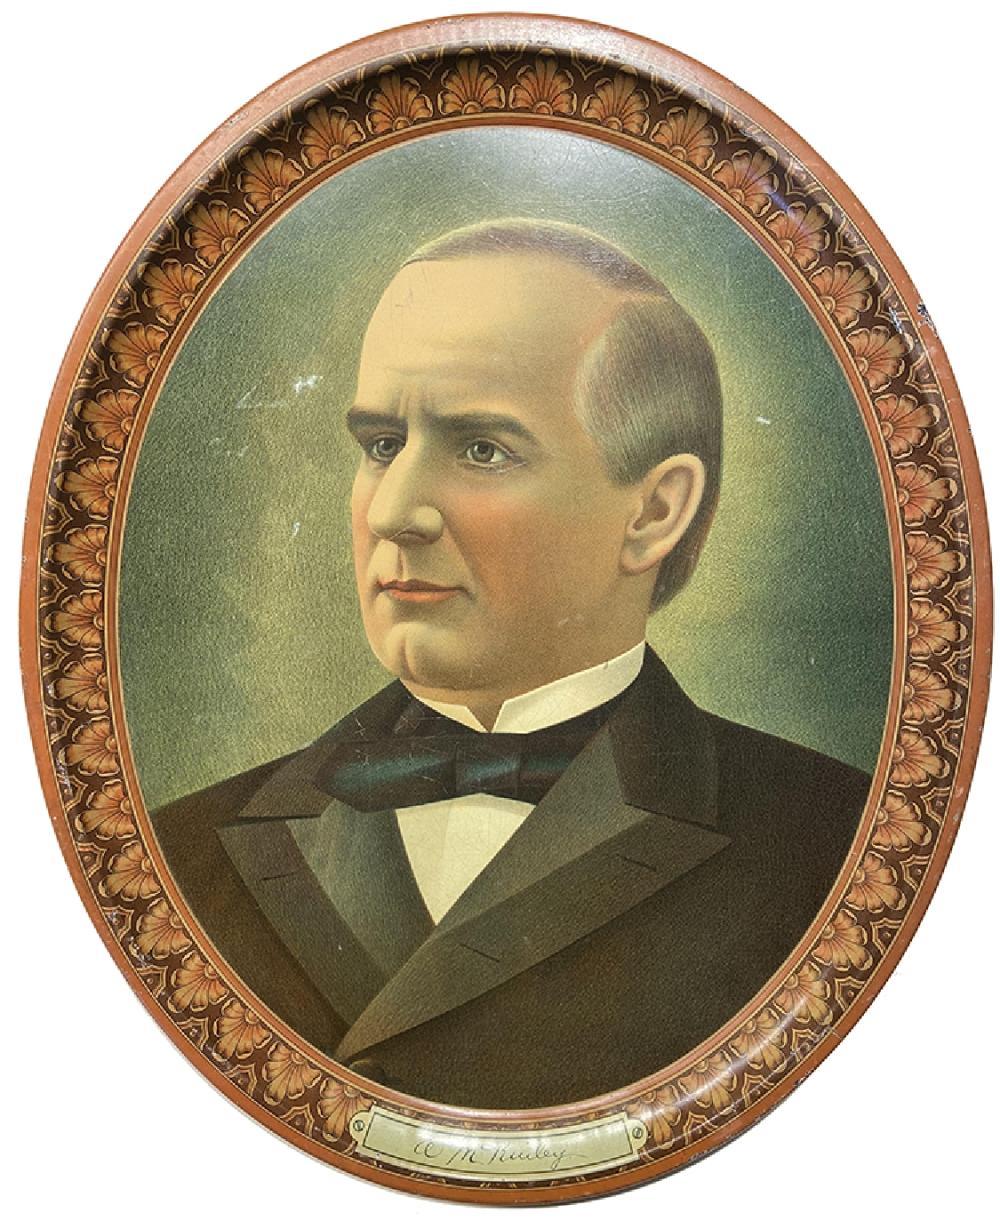 1896 WILLIAM MCKINLEY OVAL PORTRAIT TRAY PLATE